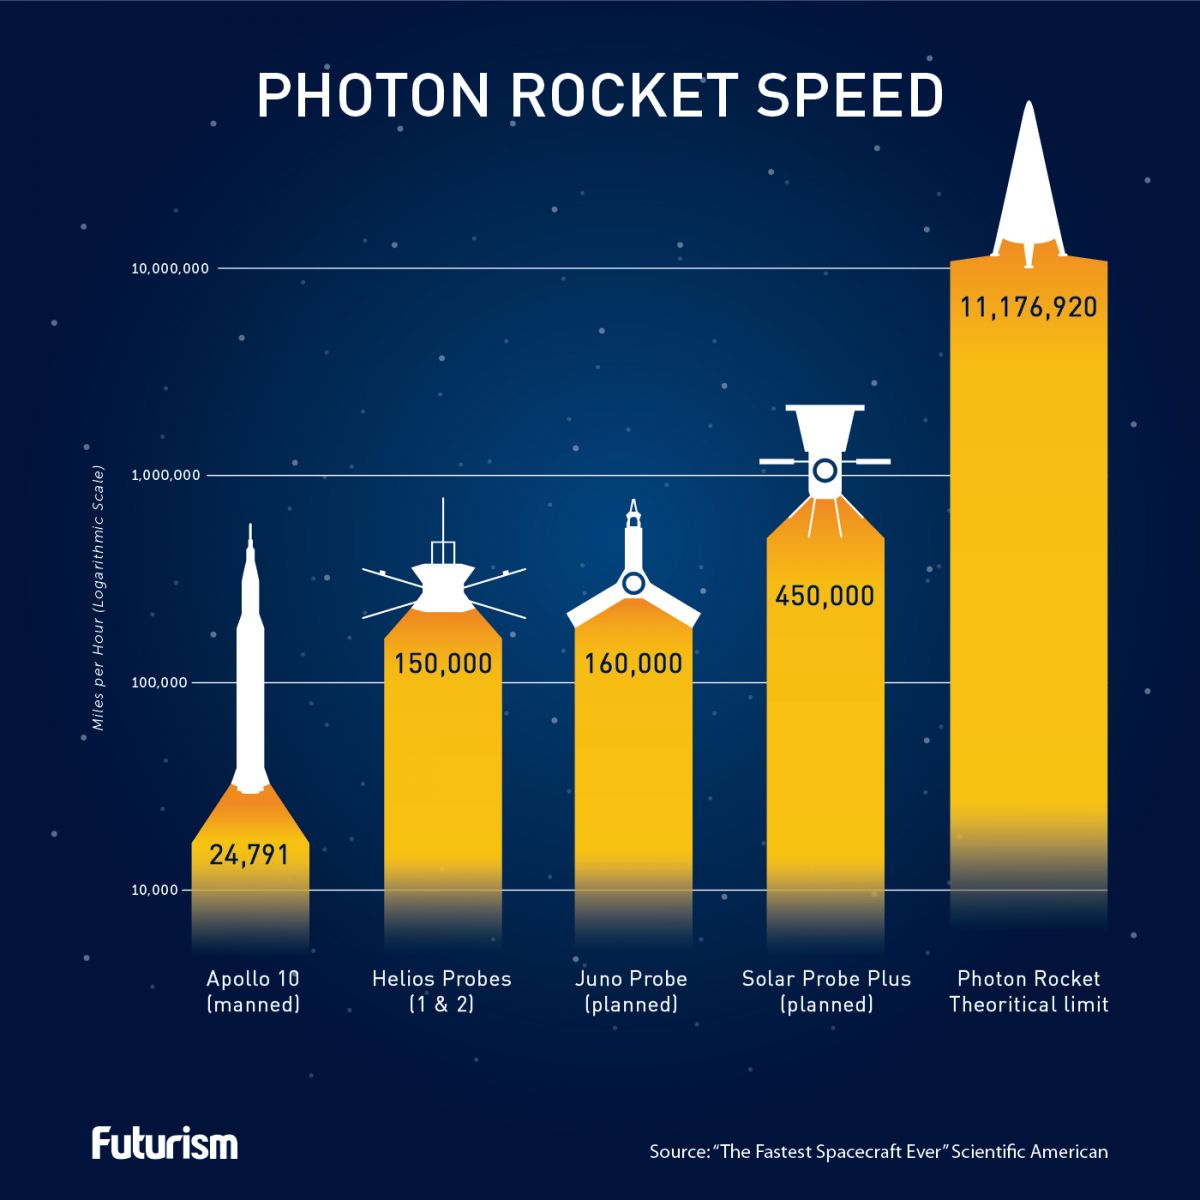 Photon-Rocket-Speed-1200x1200